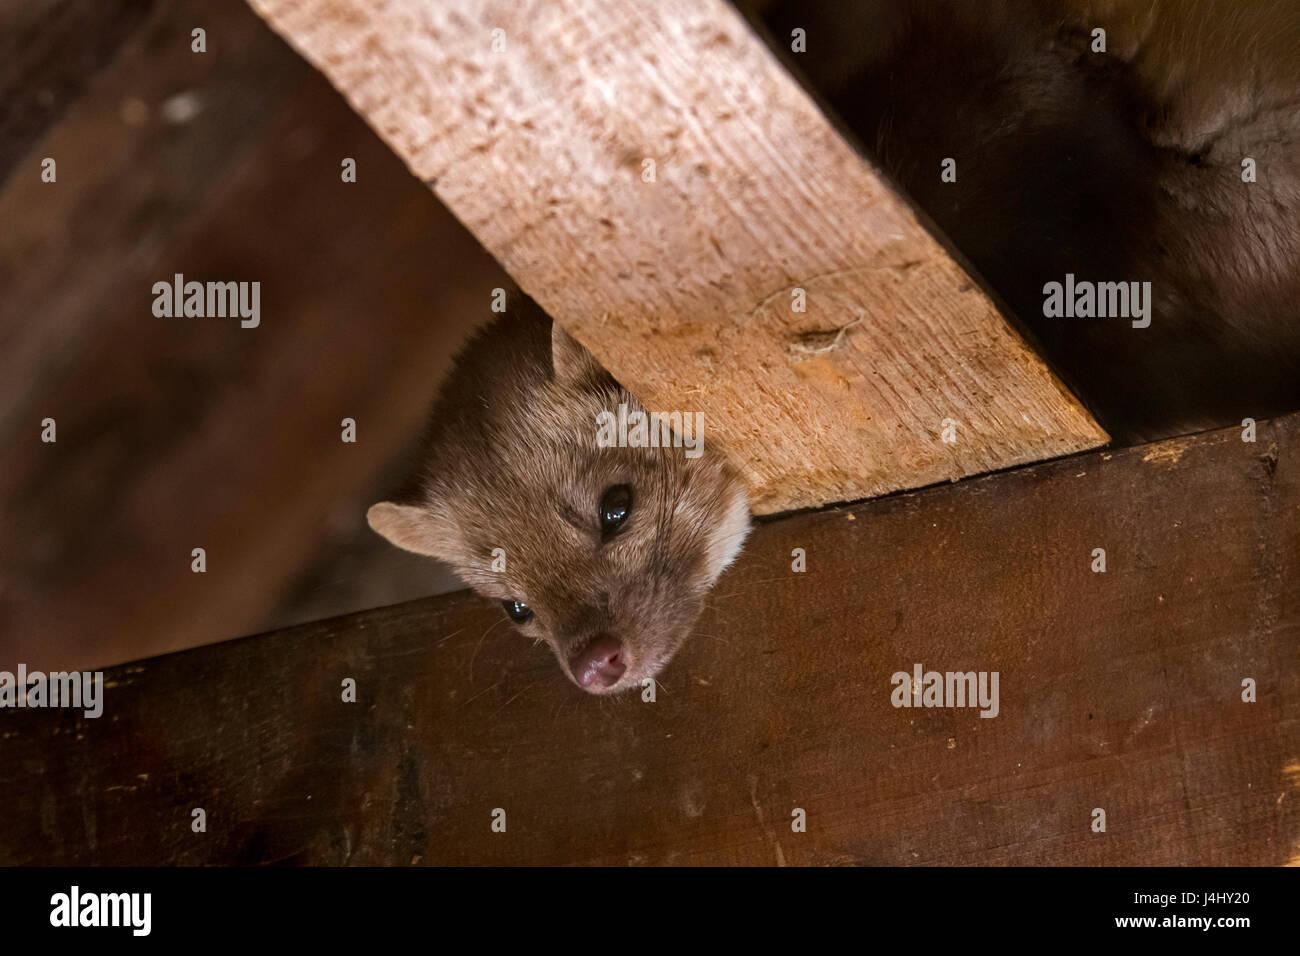 Beech marten / stone marten / house marten (Martes foina) foraging on beams in ceiling of attic - Stock Image